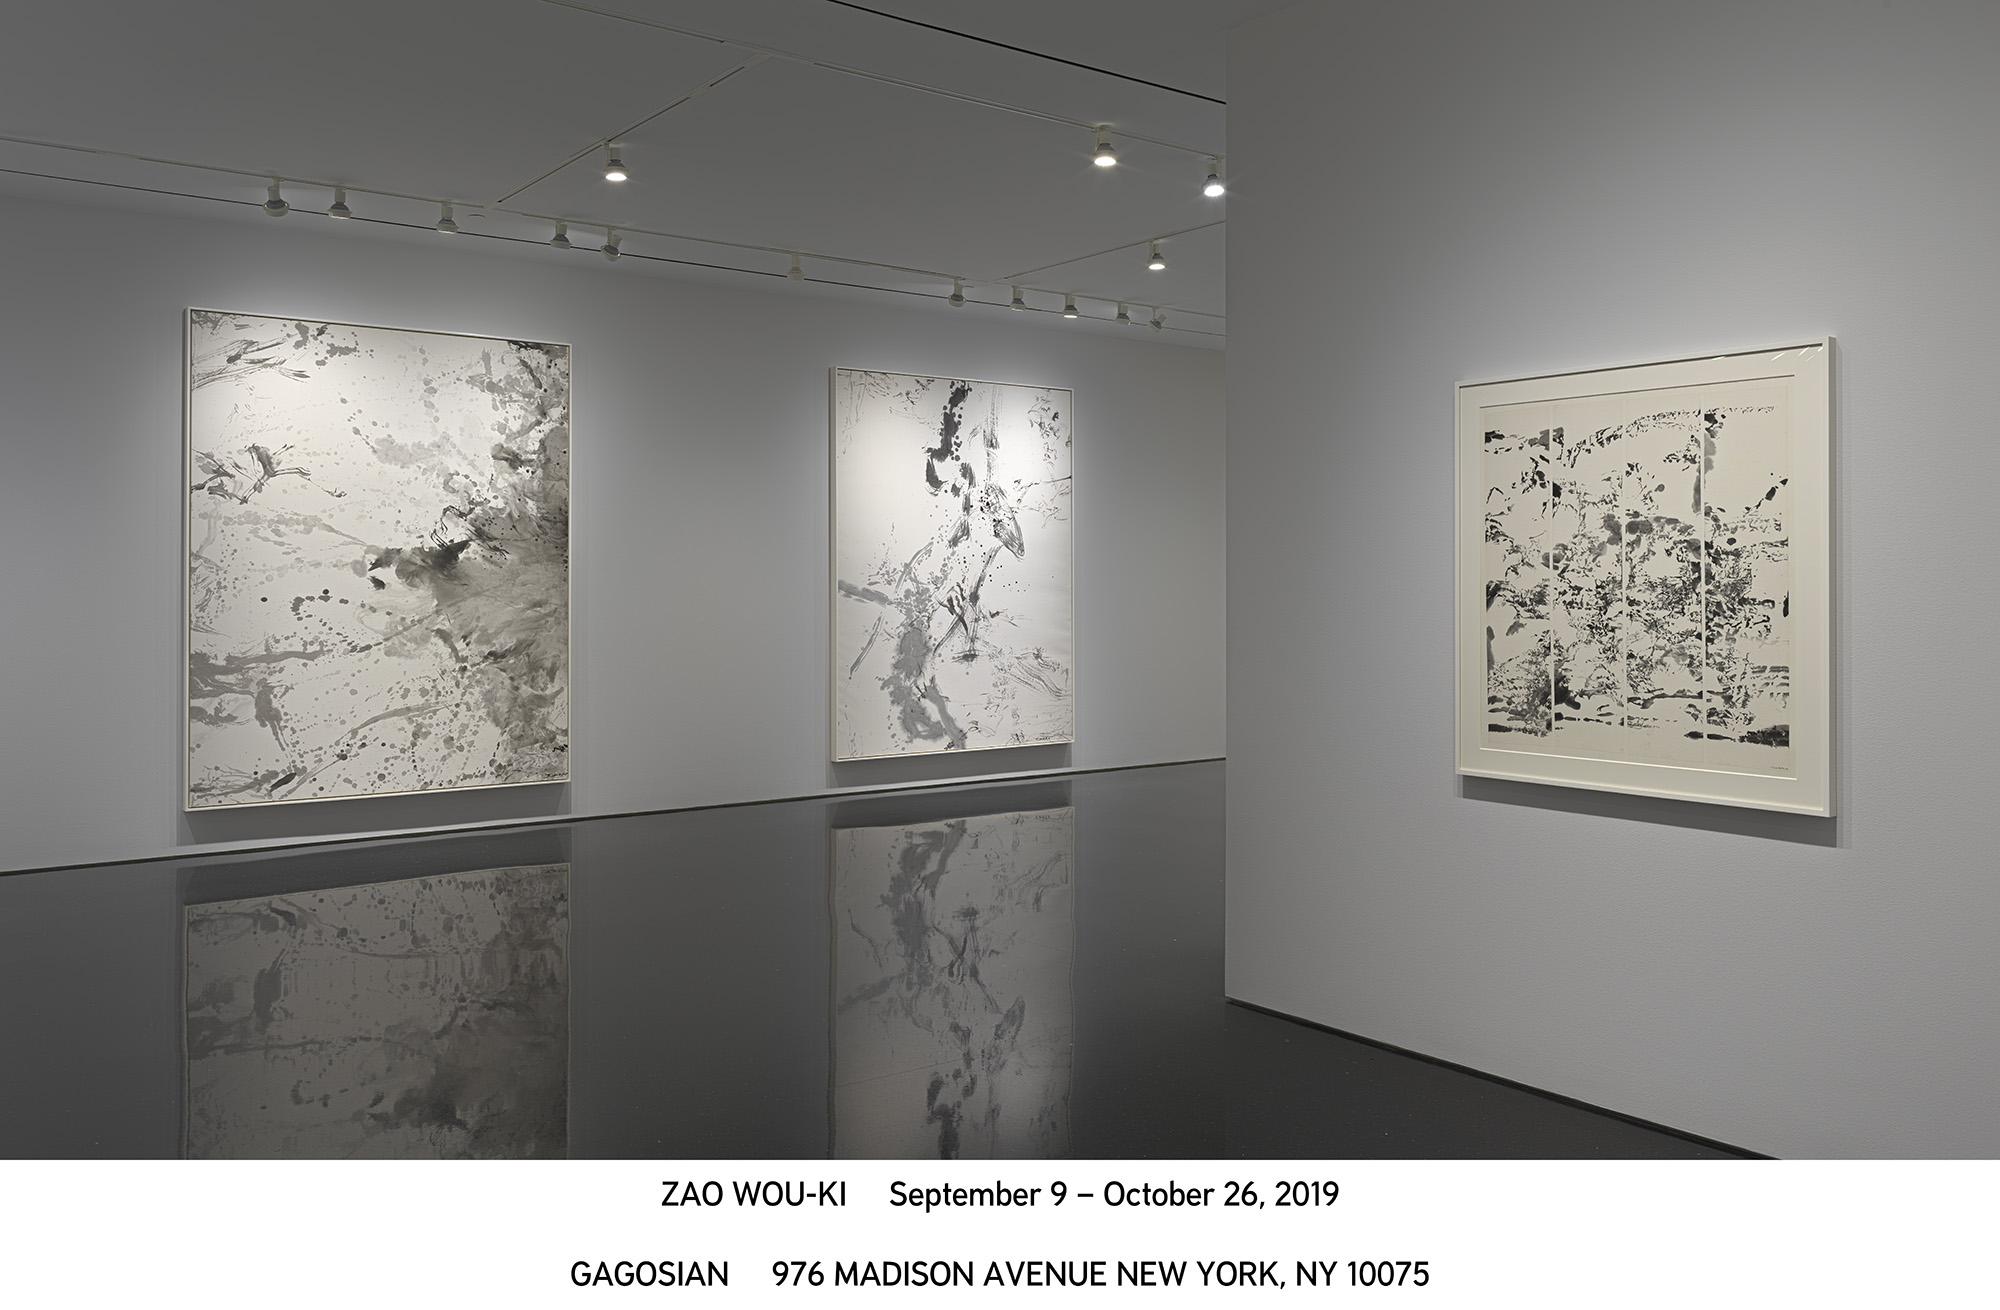 Zao Wou-Ki exhibition at the Gagosian Gallery in New York. Photo: Gagosian Gallery